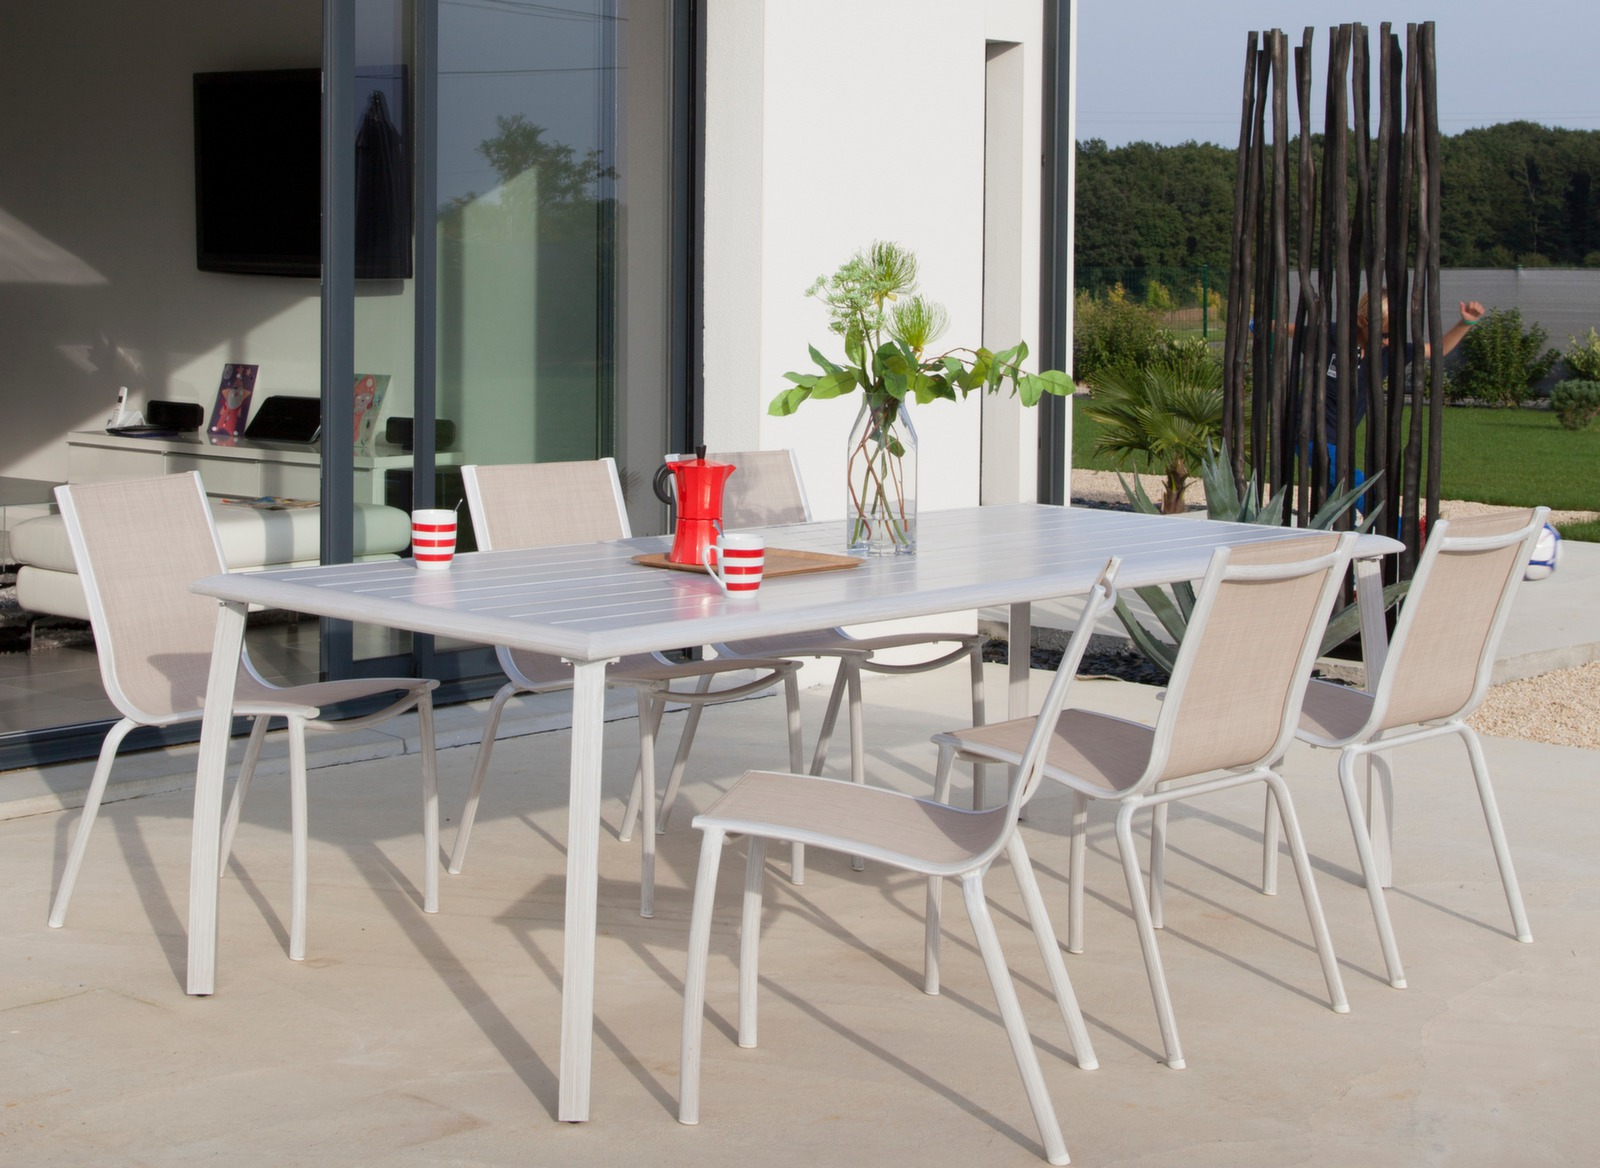 HOUSSE PROTECTION POUR TABLE 240x100 POLYESTER/PVC - GRIS